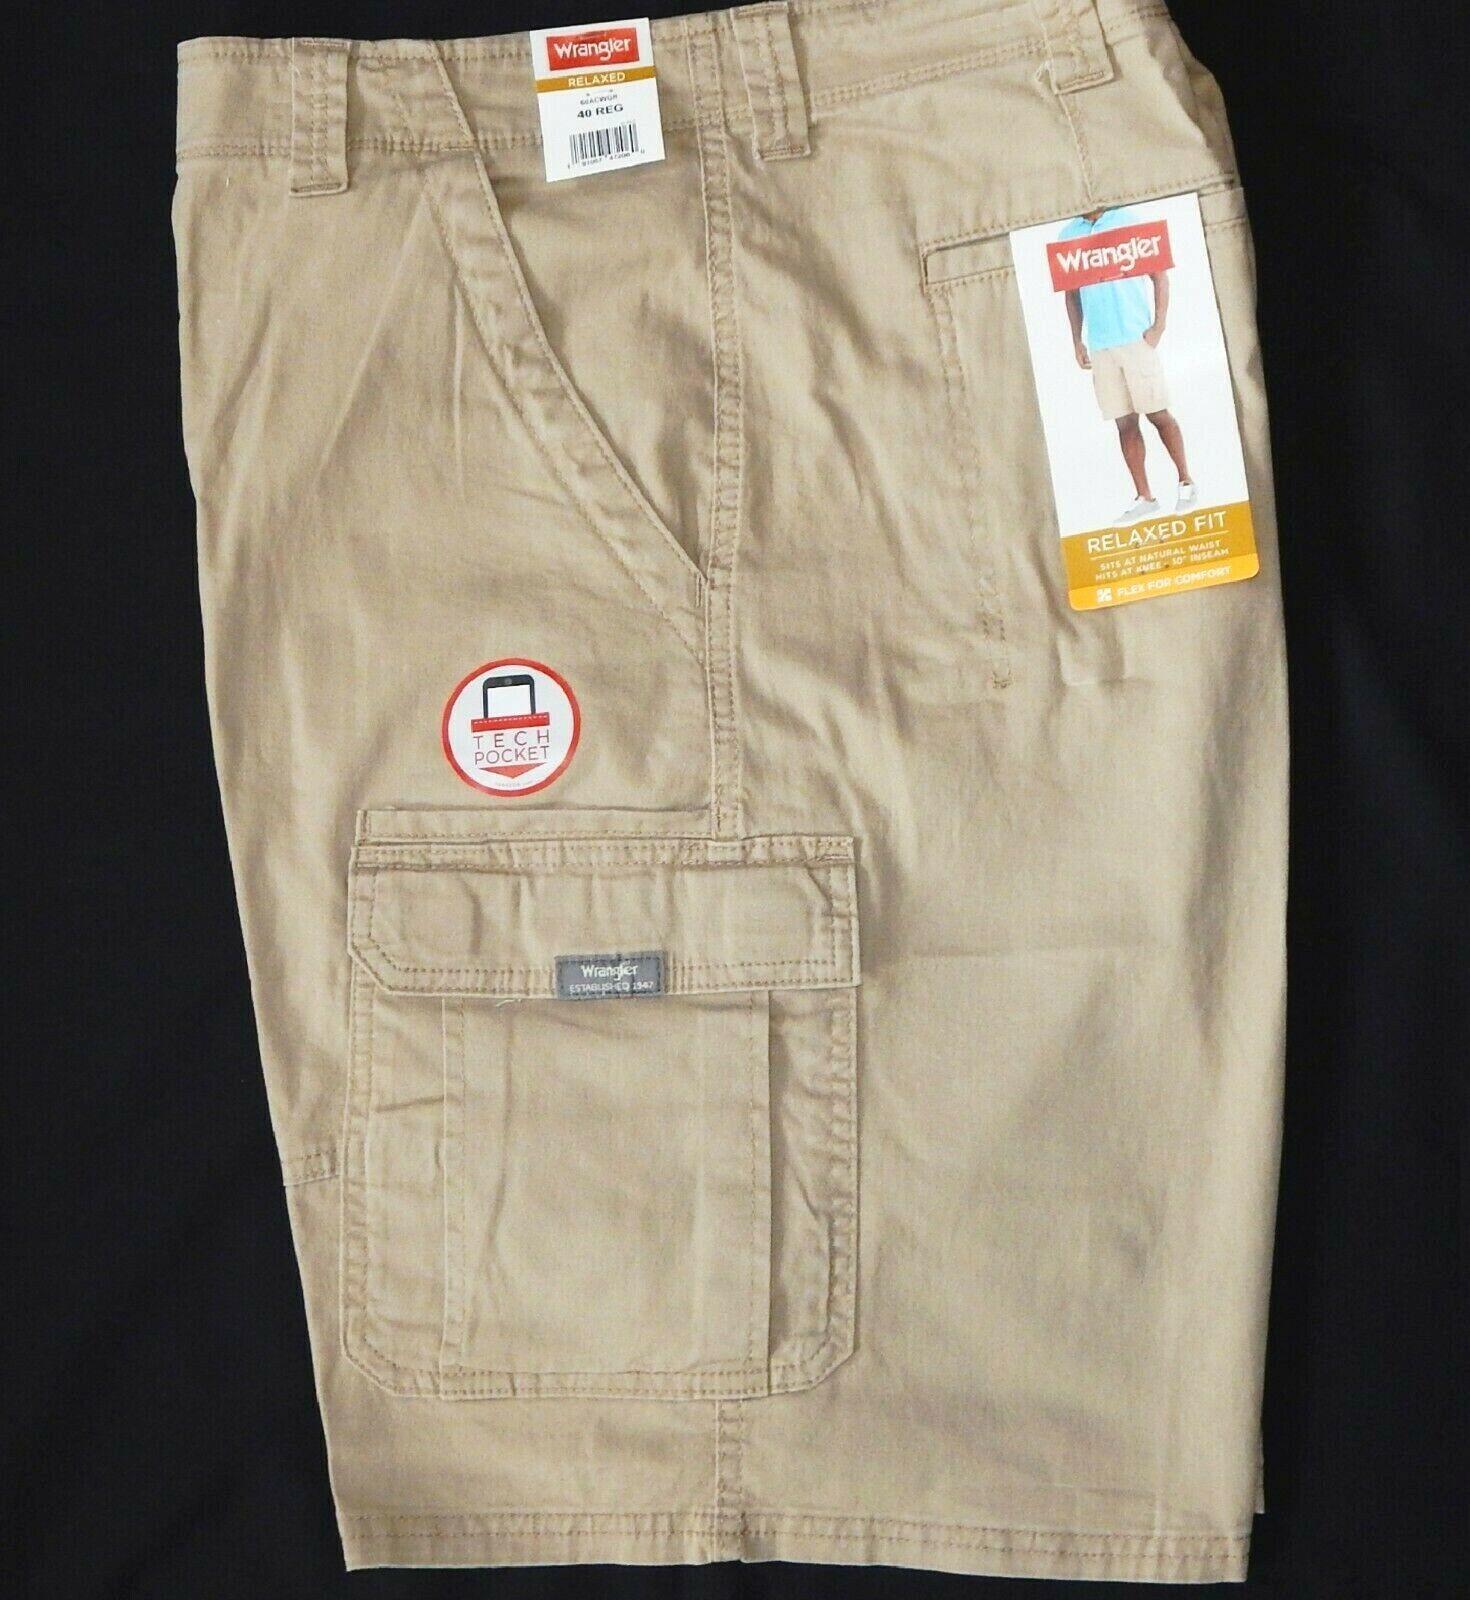 Men's Wrangler Flex Cargo Shorts Relaxed Fit w Tech Pocket K